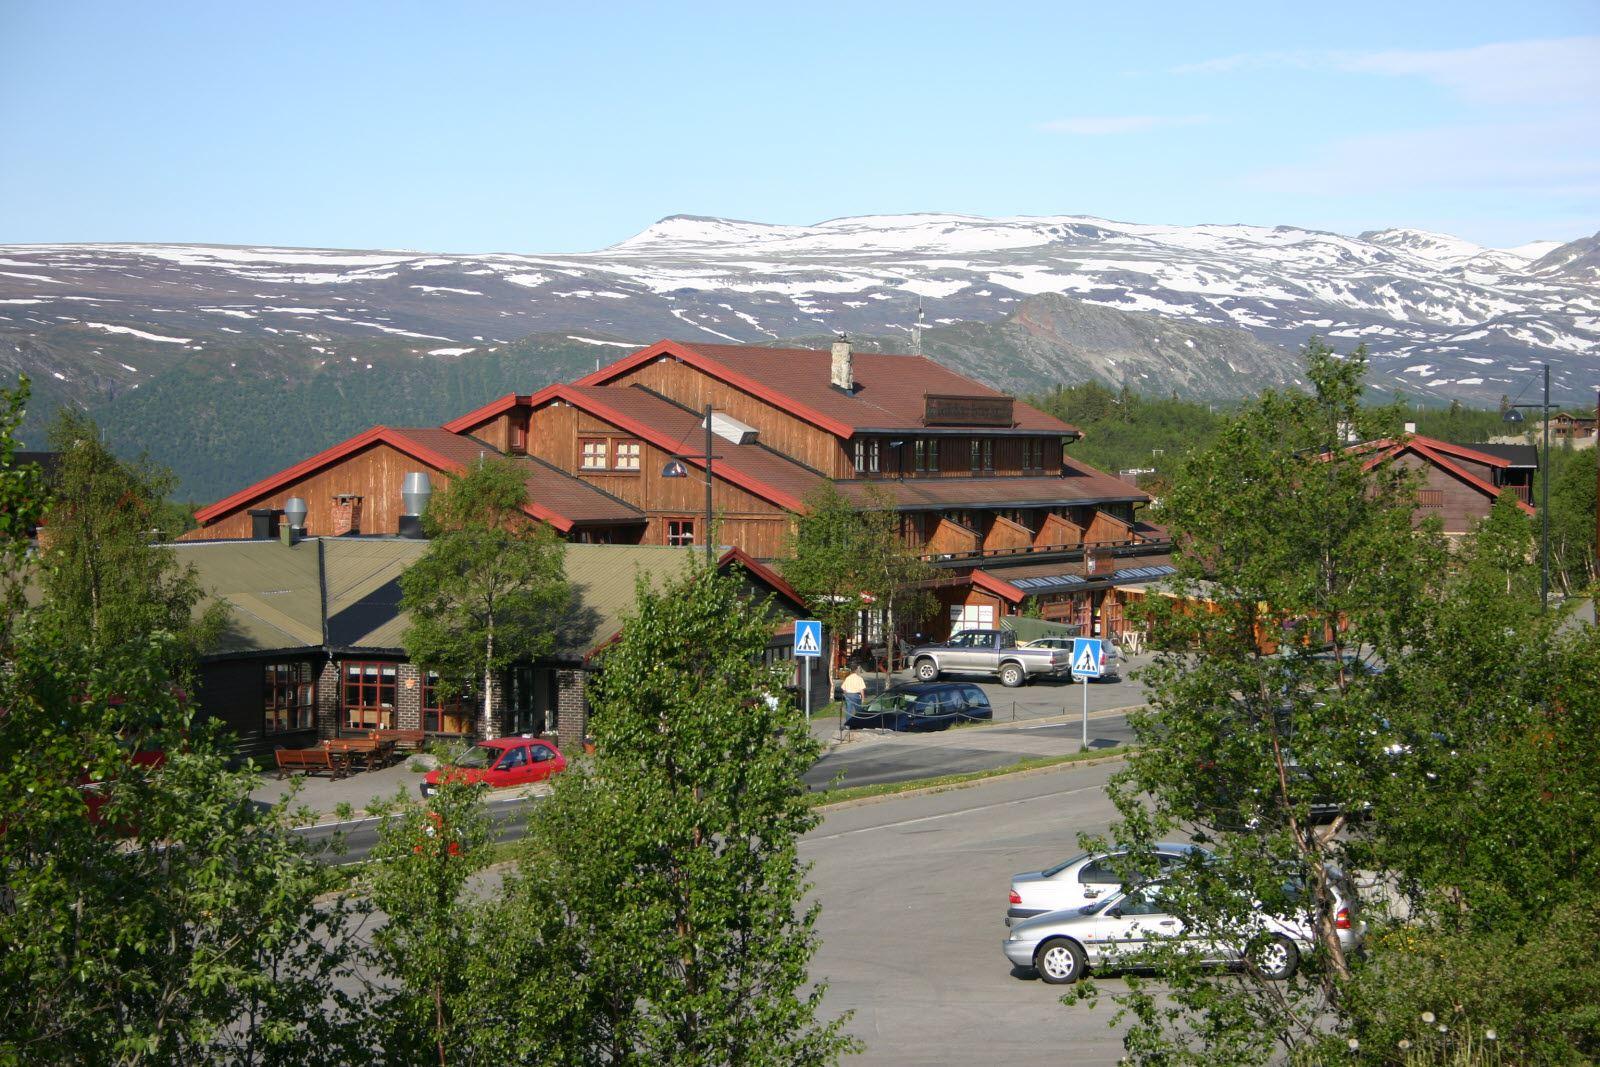 Scandic Partner - Bergo Hotel